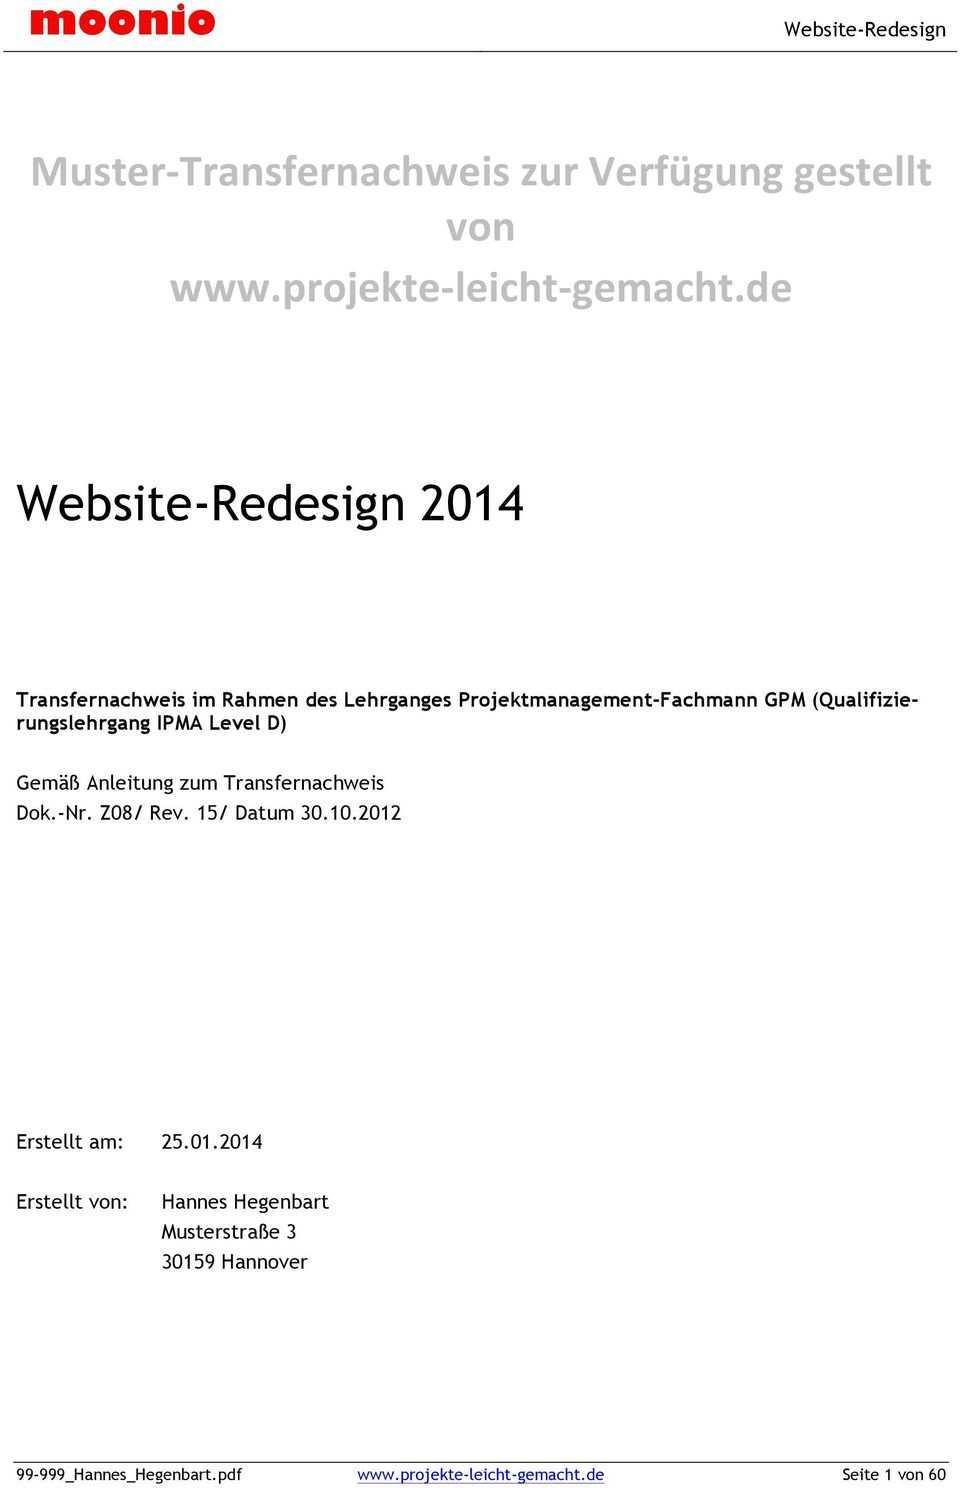 Website Redesign Pdf Free Download